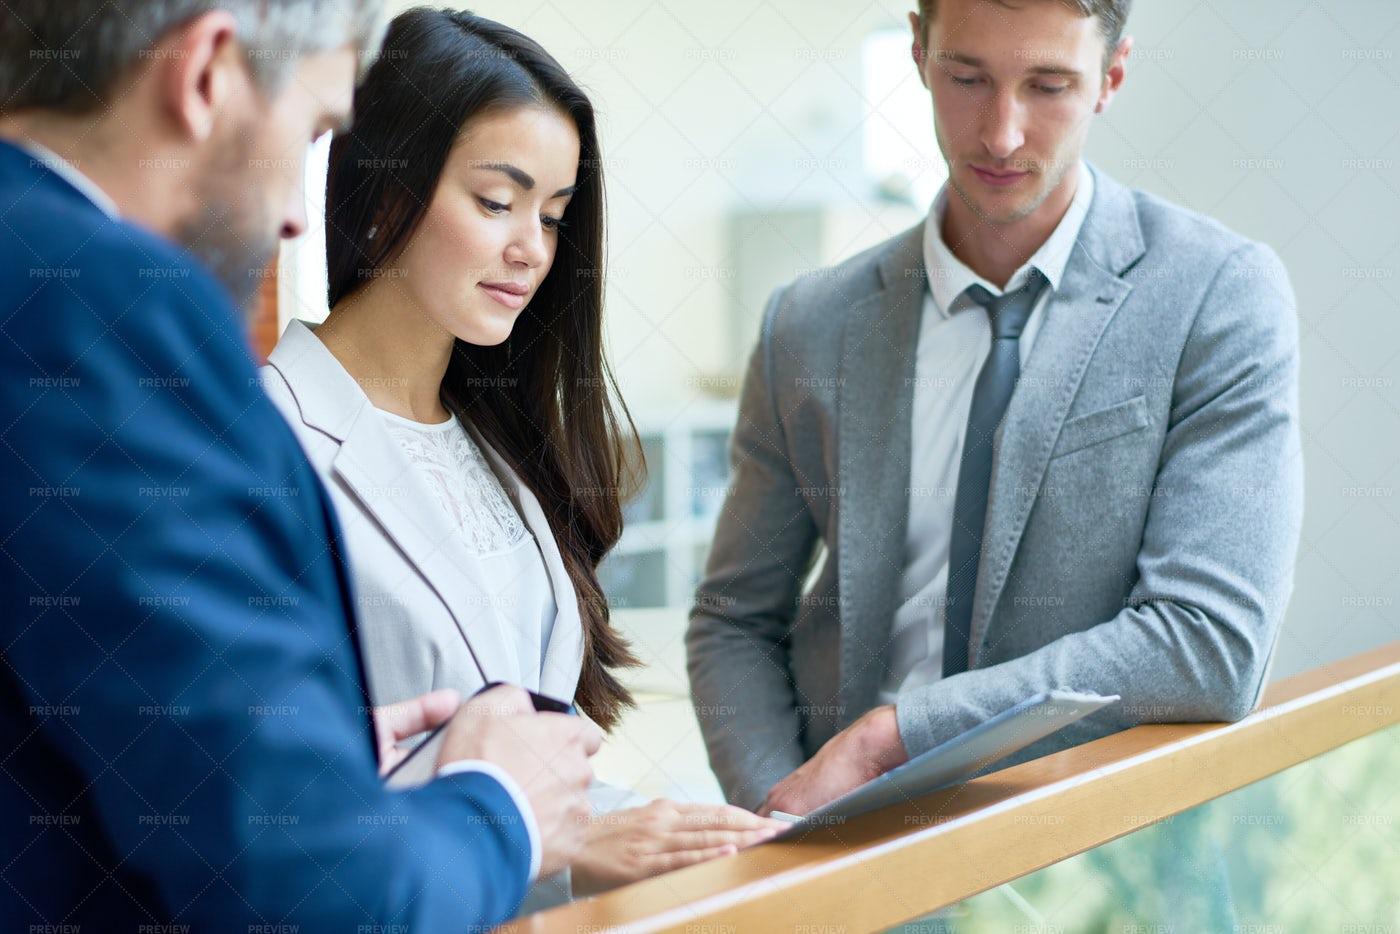 Informal Meeting At Office Lobby: Stock Photos